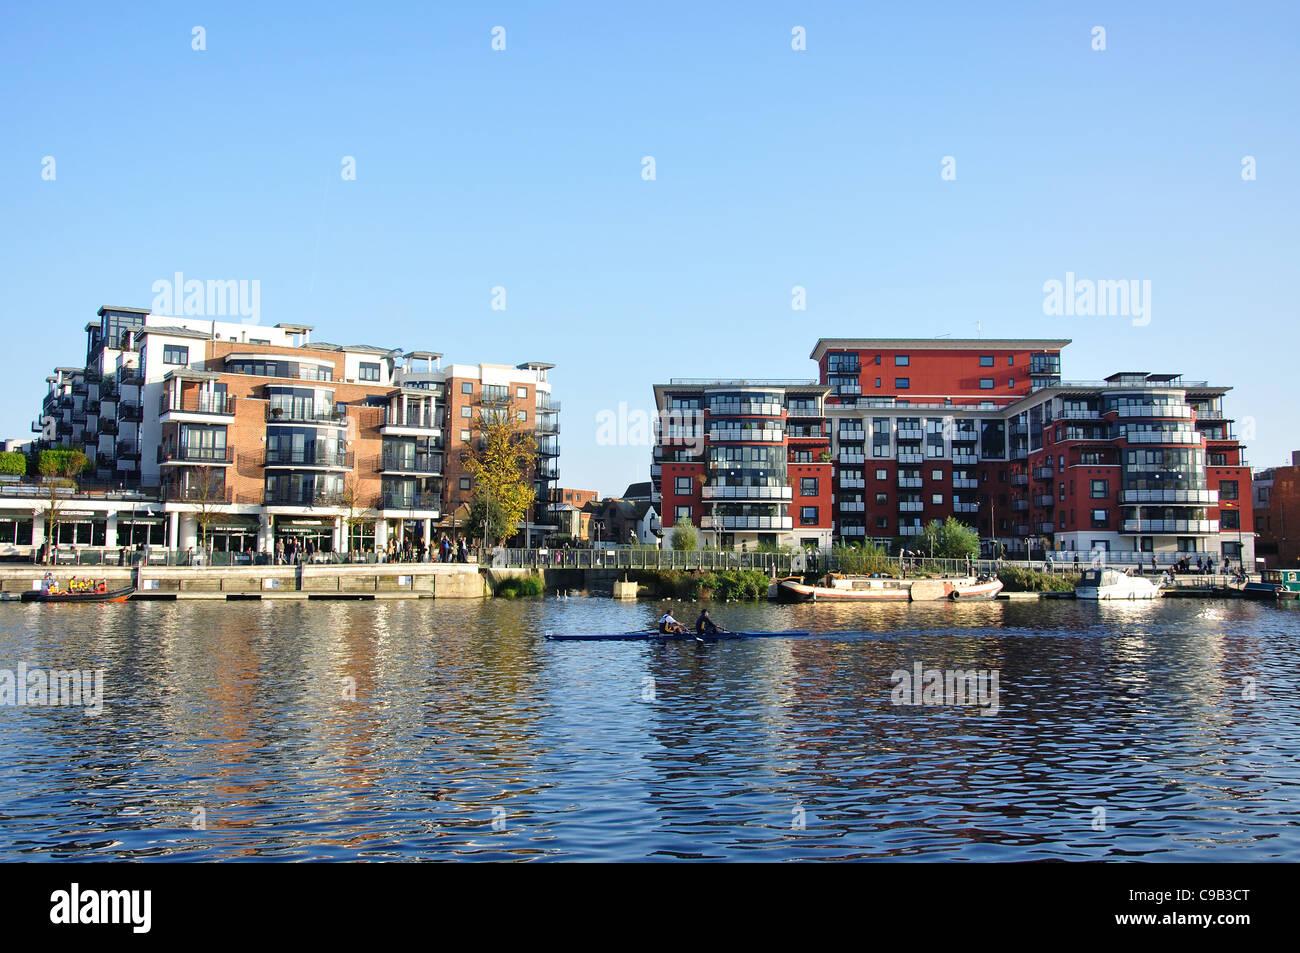 Riverside Apartments, Kingston Upon Thames, Royal Borough Of Kingston Upon  Thames, Greater London, England, United Kingdom